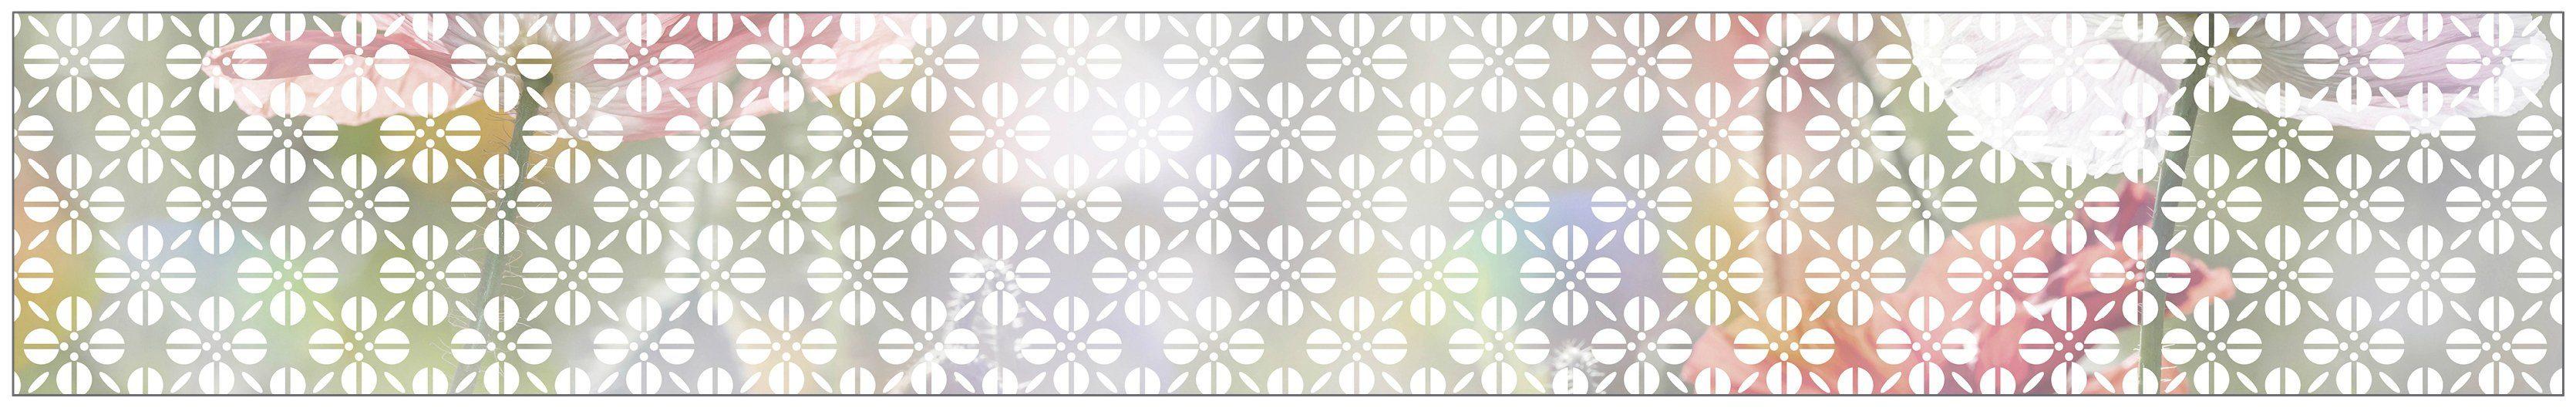 MYSPOTTI Fensterfolie »mySPOTTI look Grafik Blumenmuster white«, 200 x 30 cm, statisch haftend